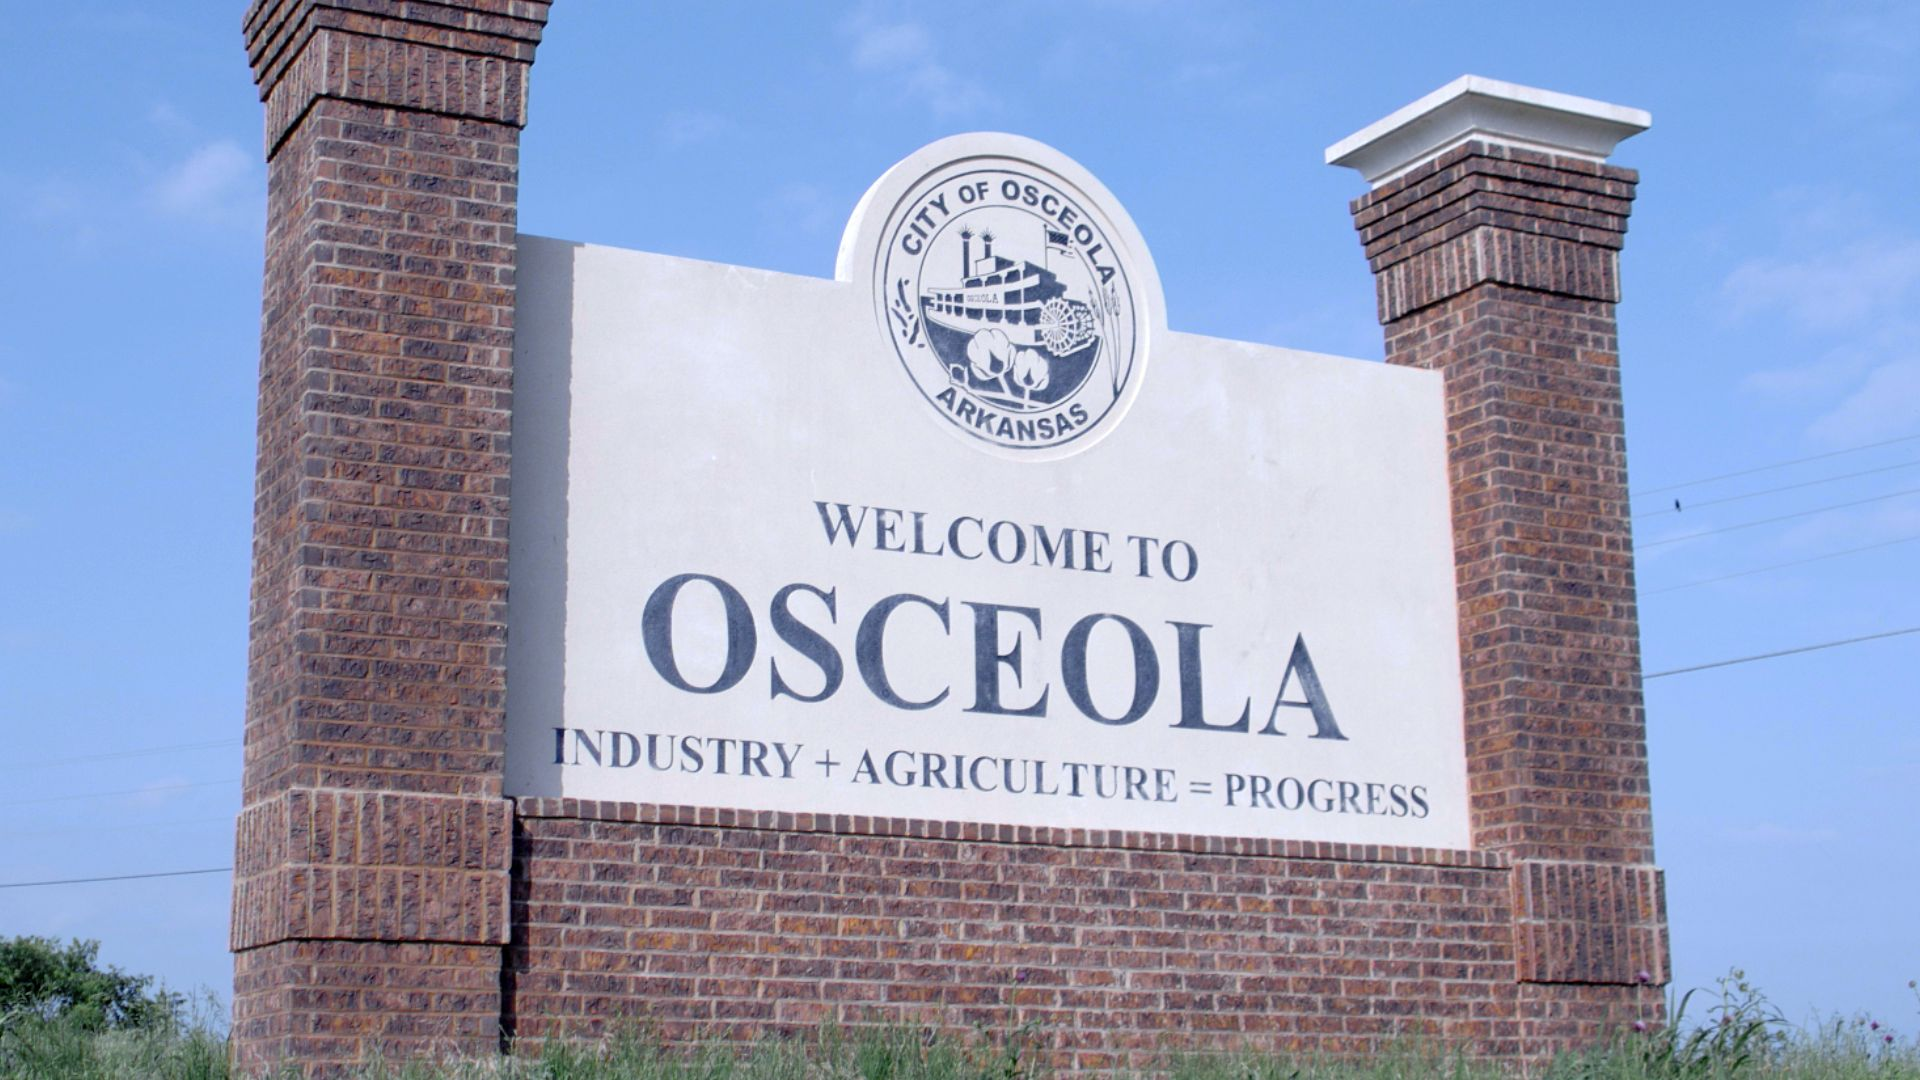 Osceola Interstate Sign.jpg